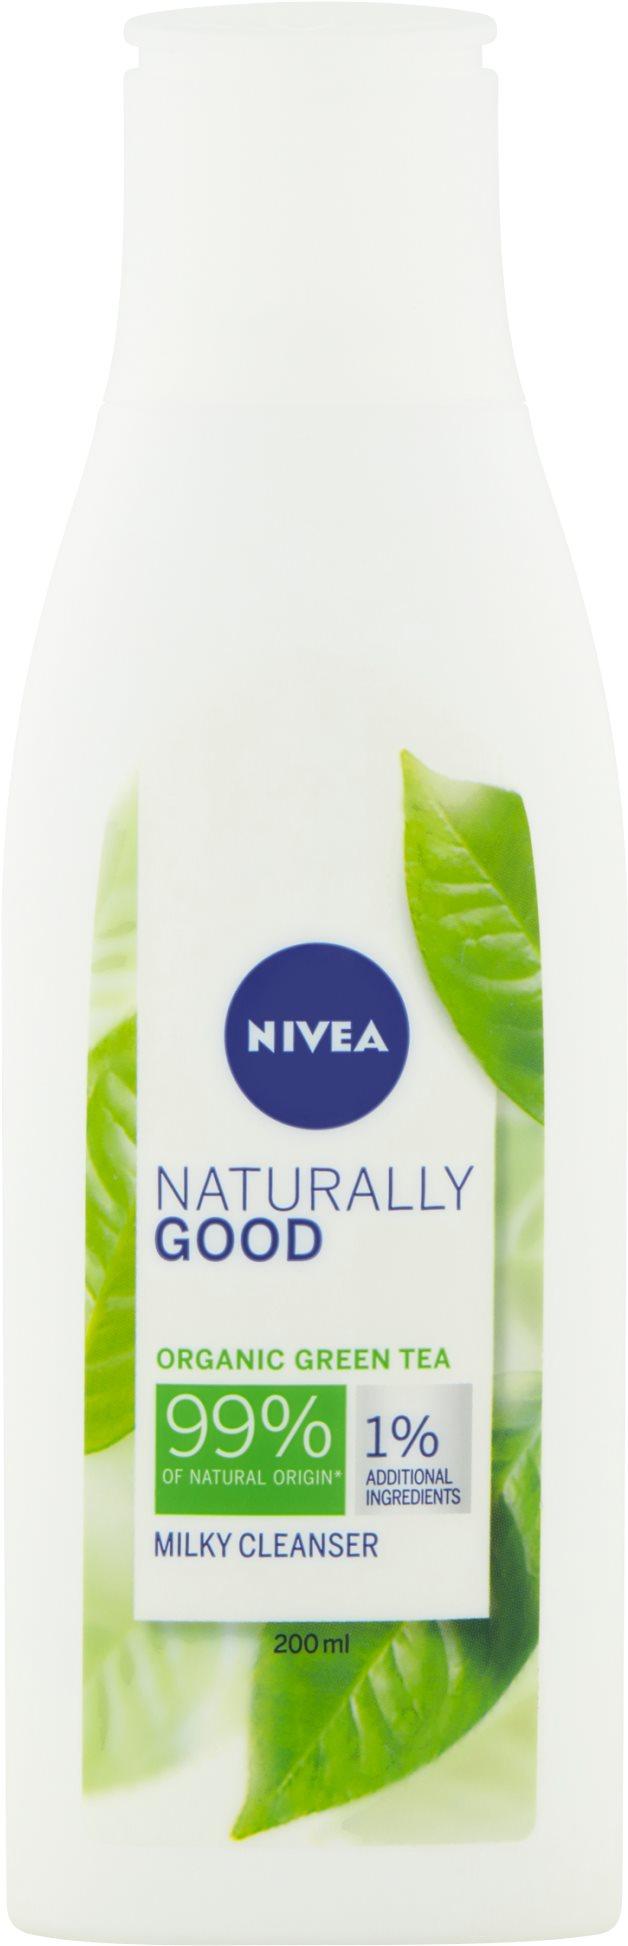 NIVEA Naturally Good Milky Cleanser 200 ml